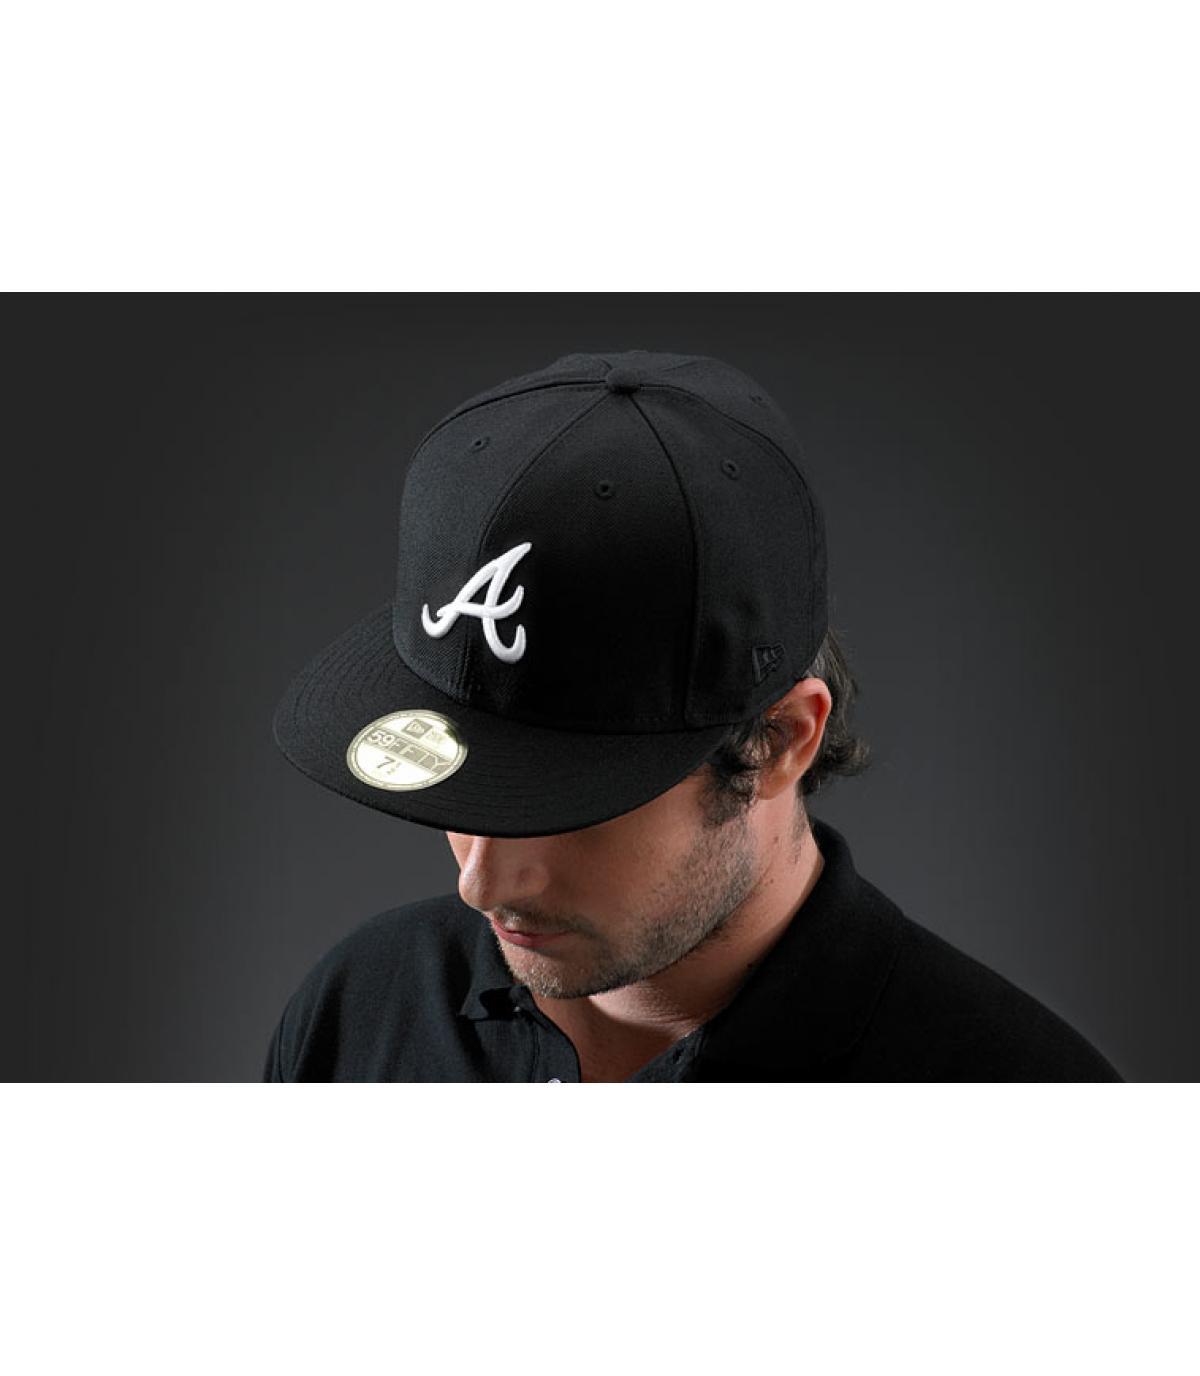 Cappellino atlanta nero bianco